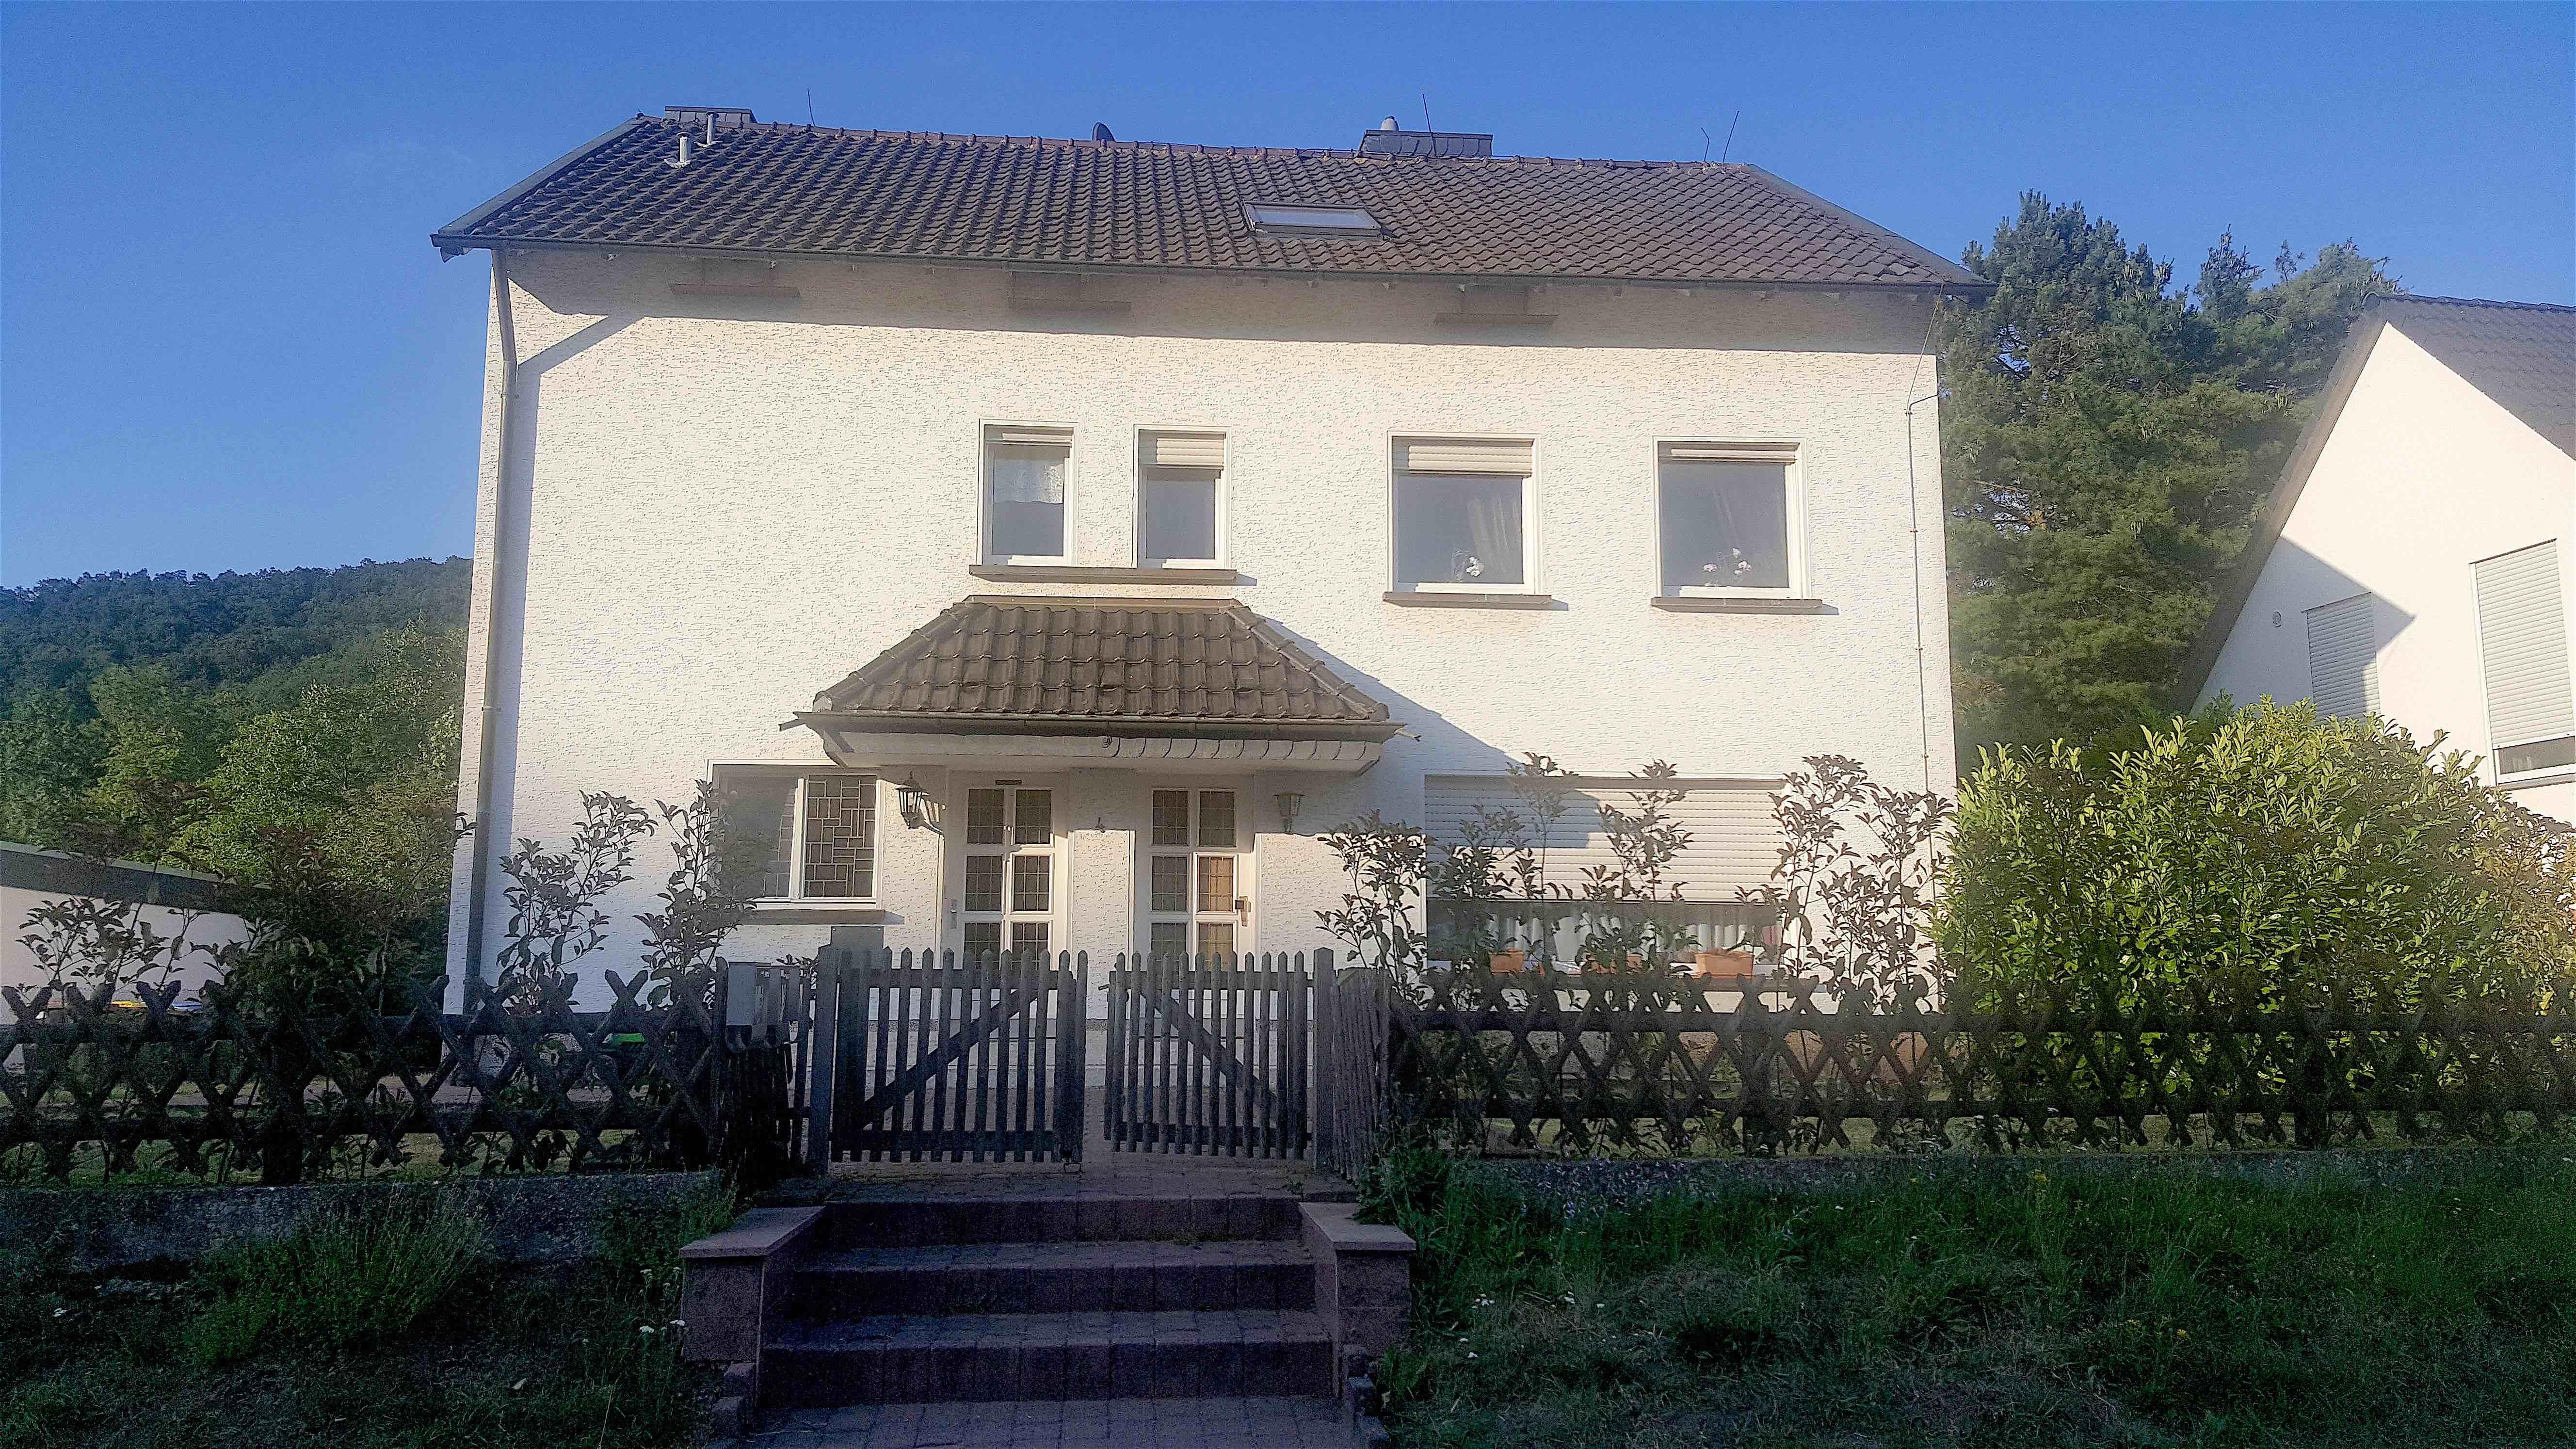 53902 Bad Münstereifel, MFH-Umnutzung EFH